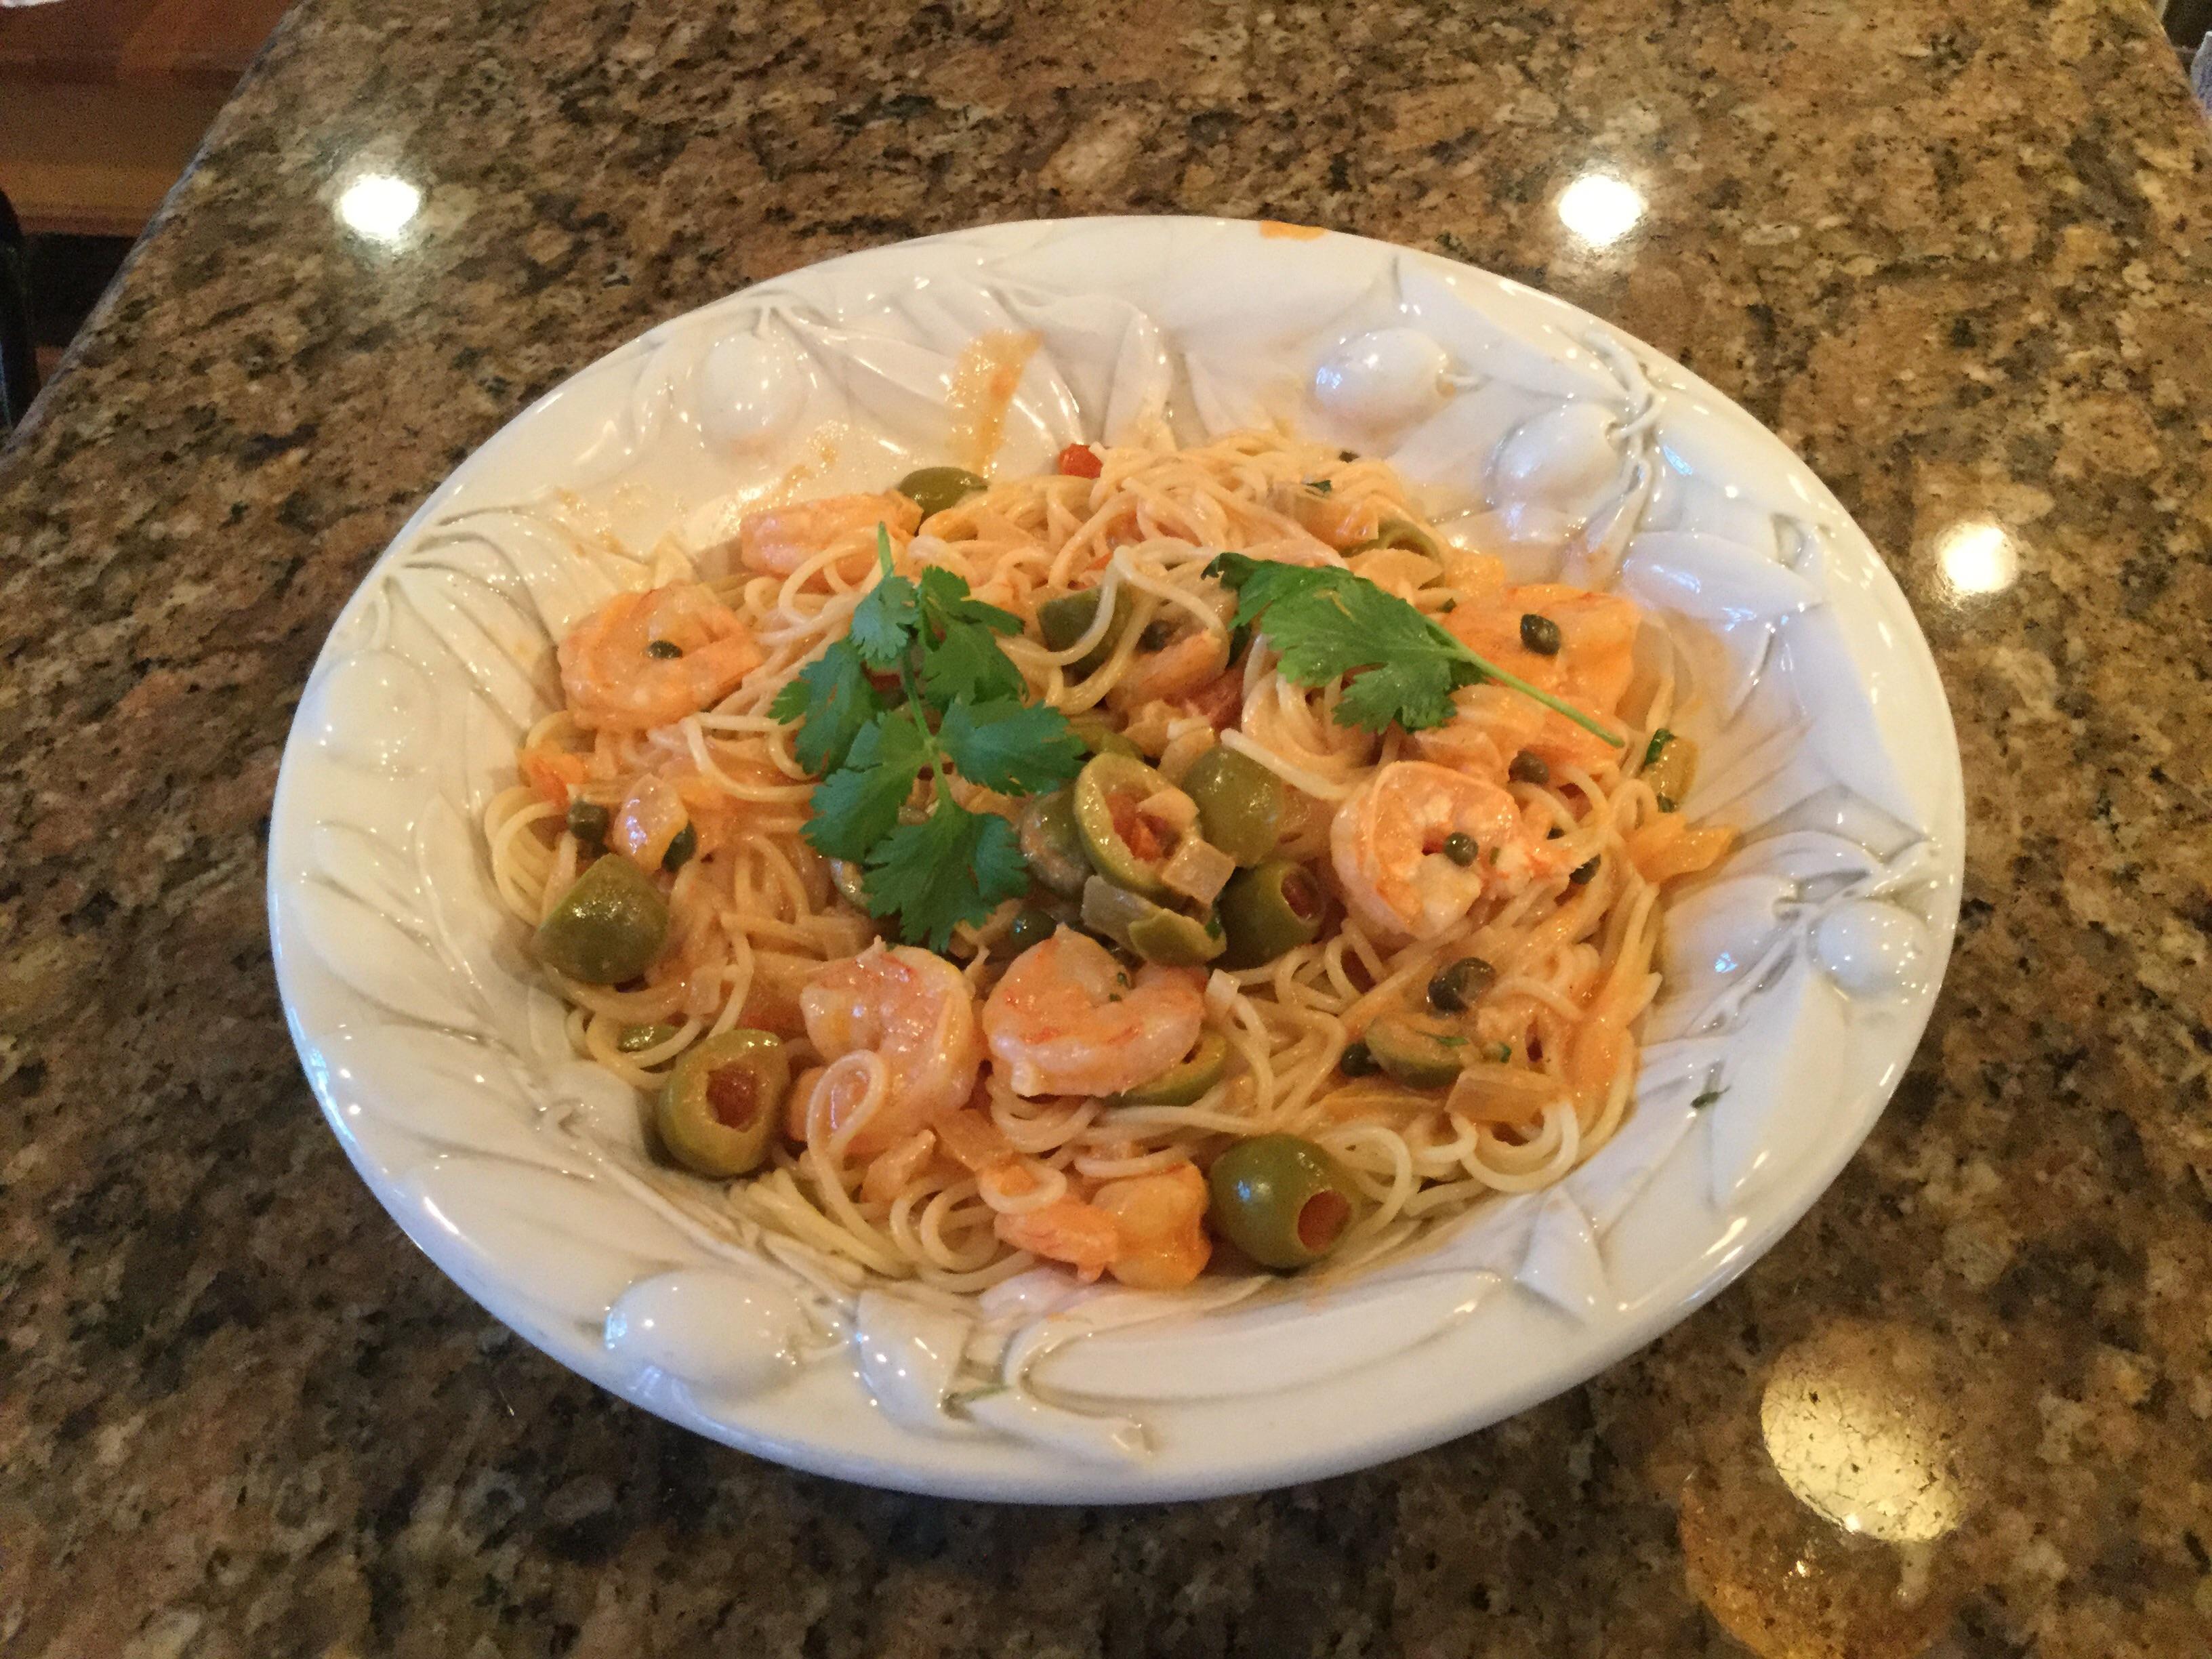 Shrimp Scampi Pasta with White Wine Sauce Matt Man Terps